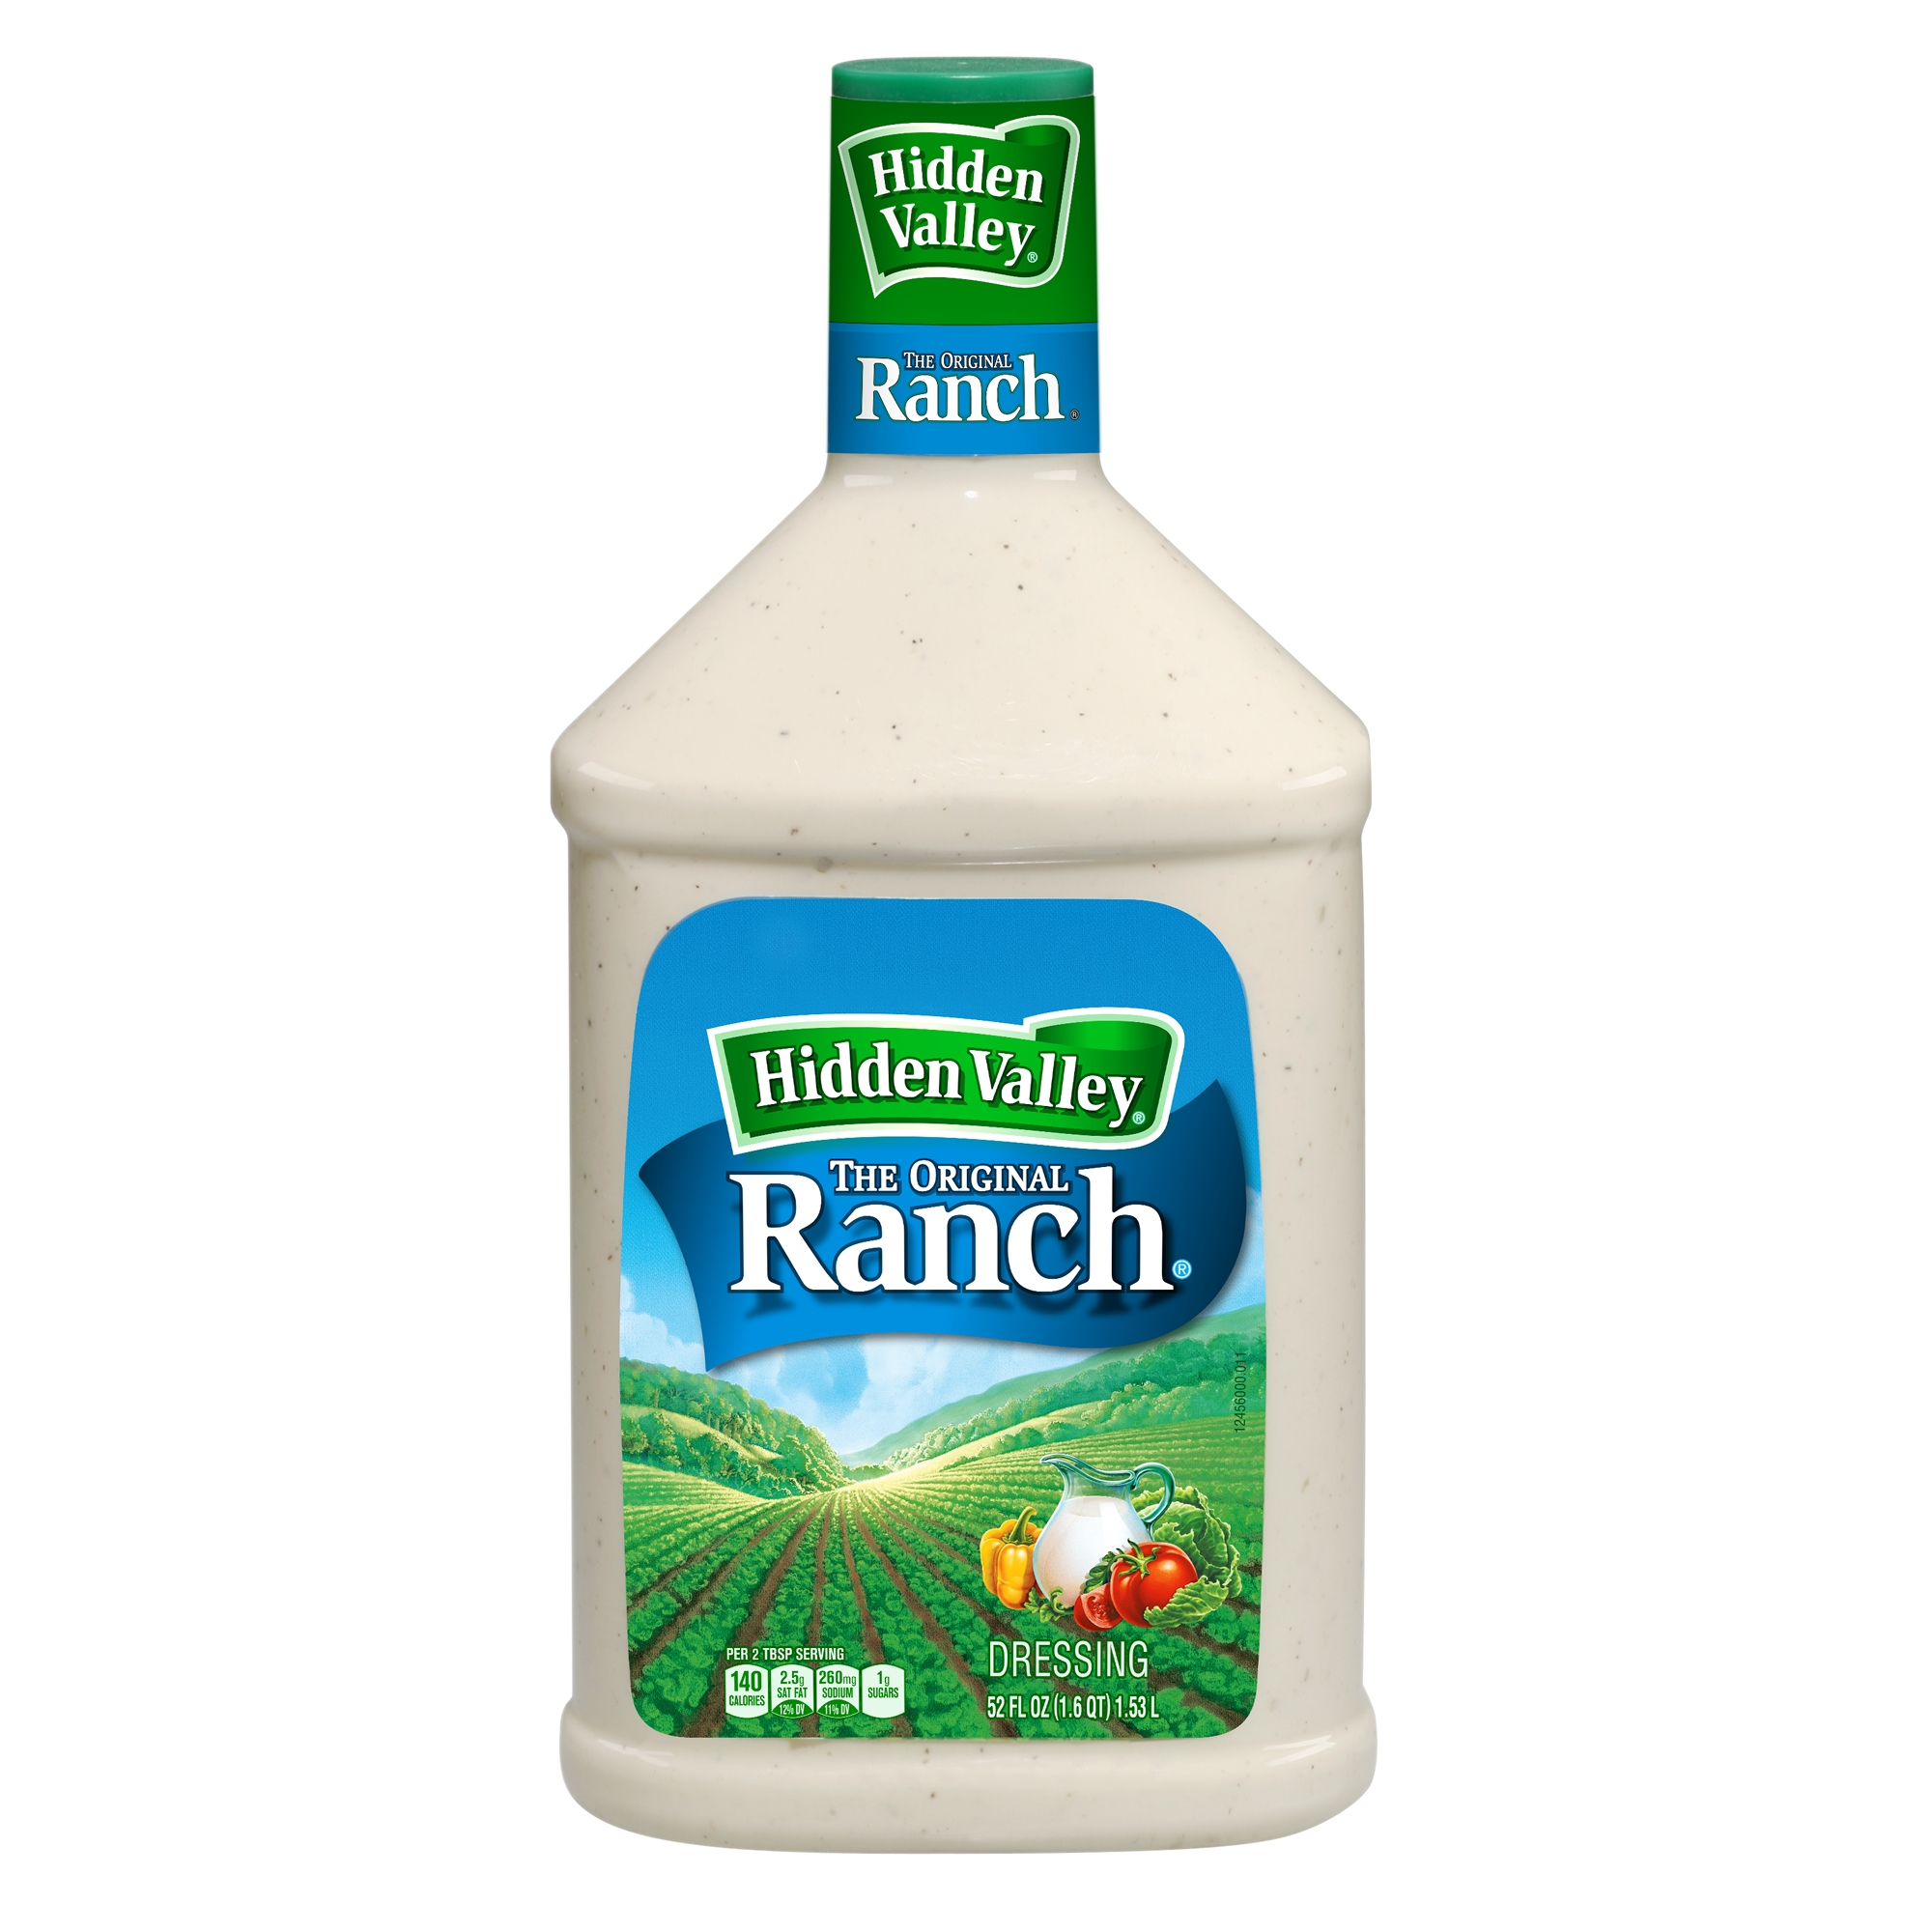 Hidden Valley Original Ranch Salad Dressing & Topping, Gluten Free - 52 oz Bottle